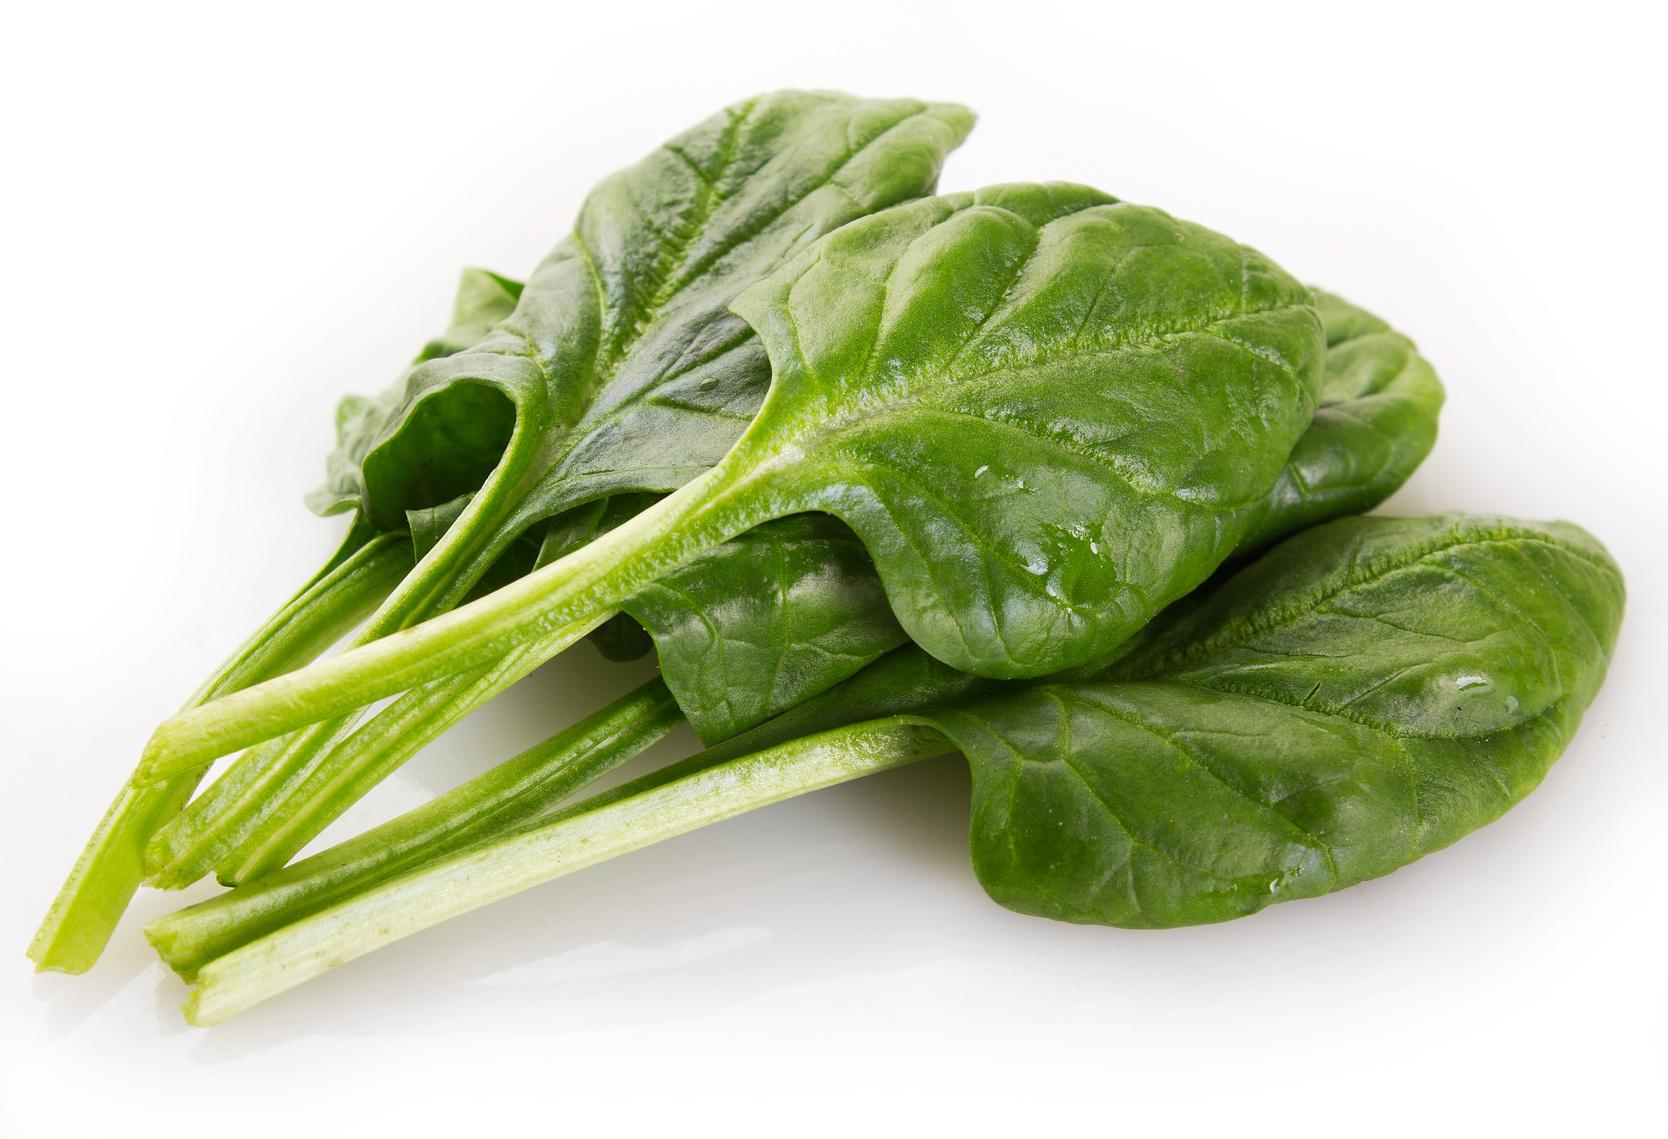 urbanfarmerly.com/spinach